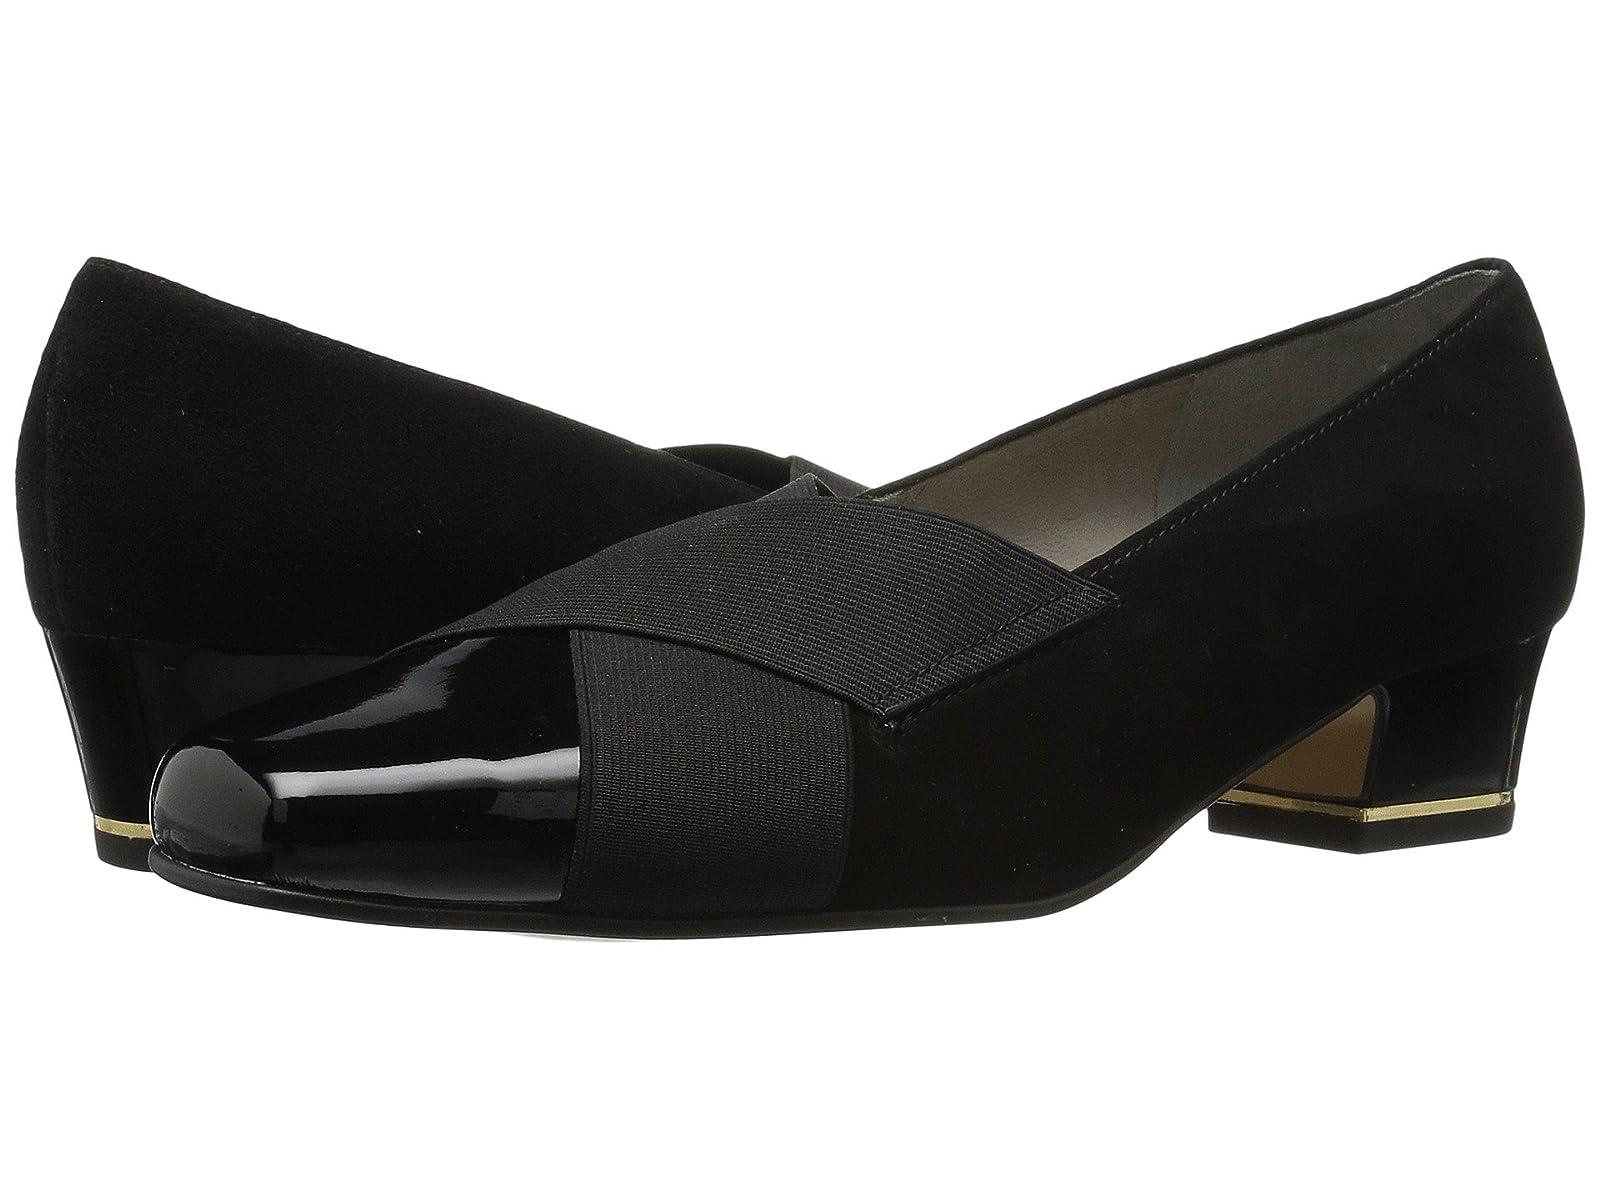 ara GinaCheap and distinctive eye-catching shoes